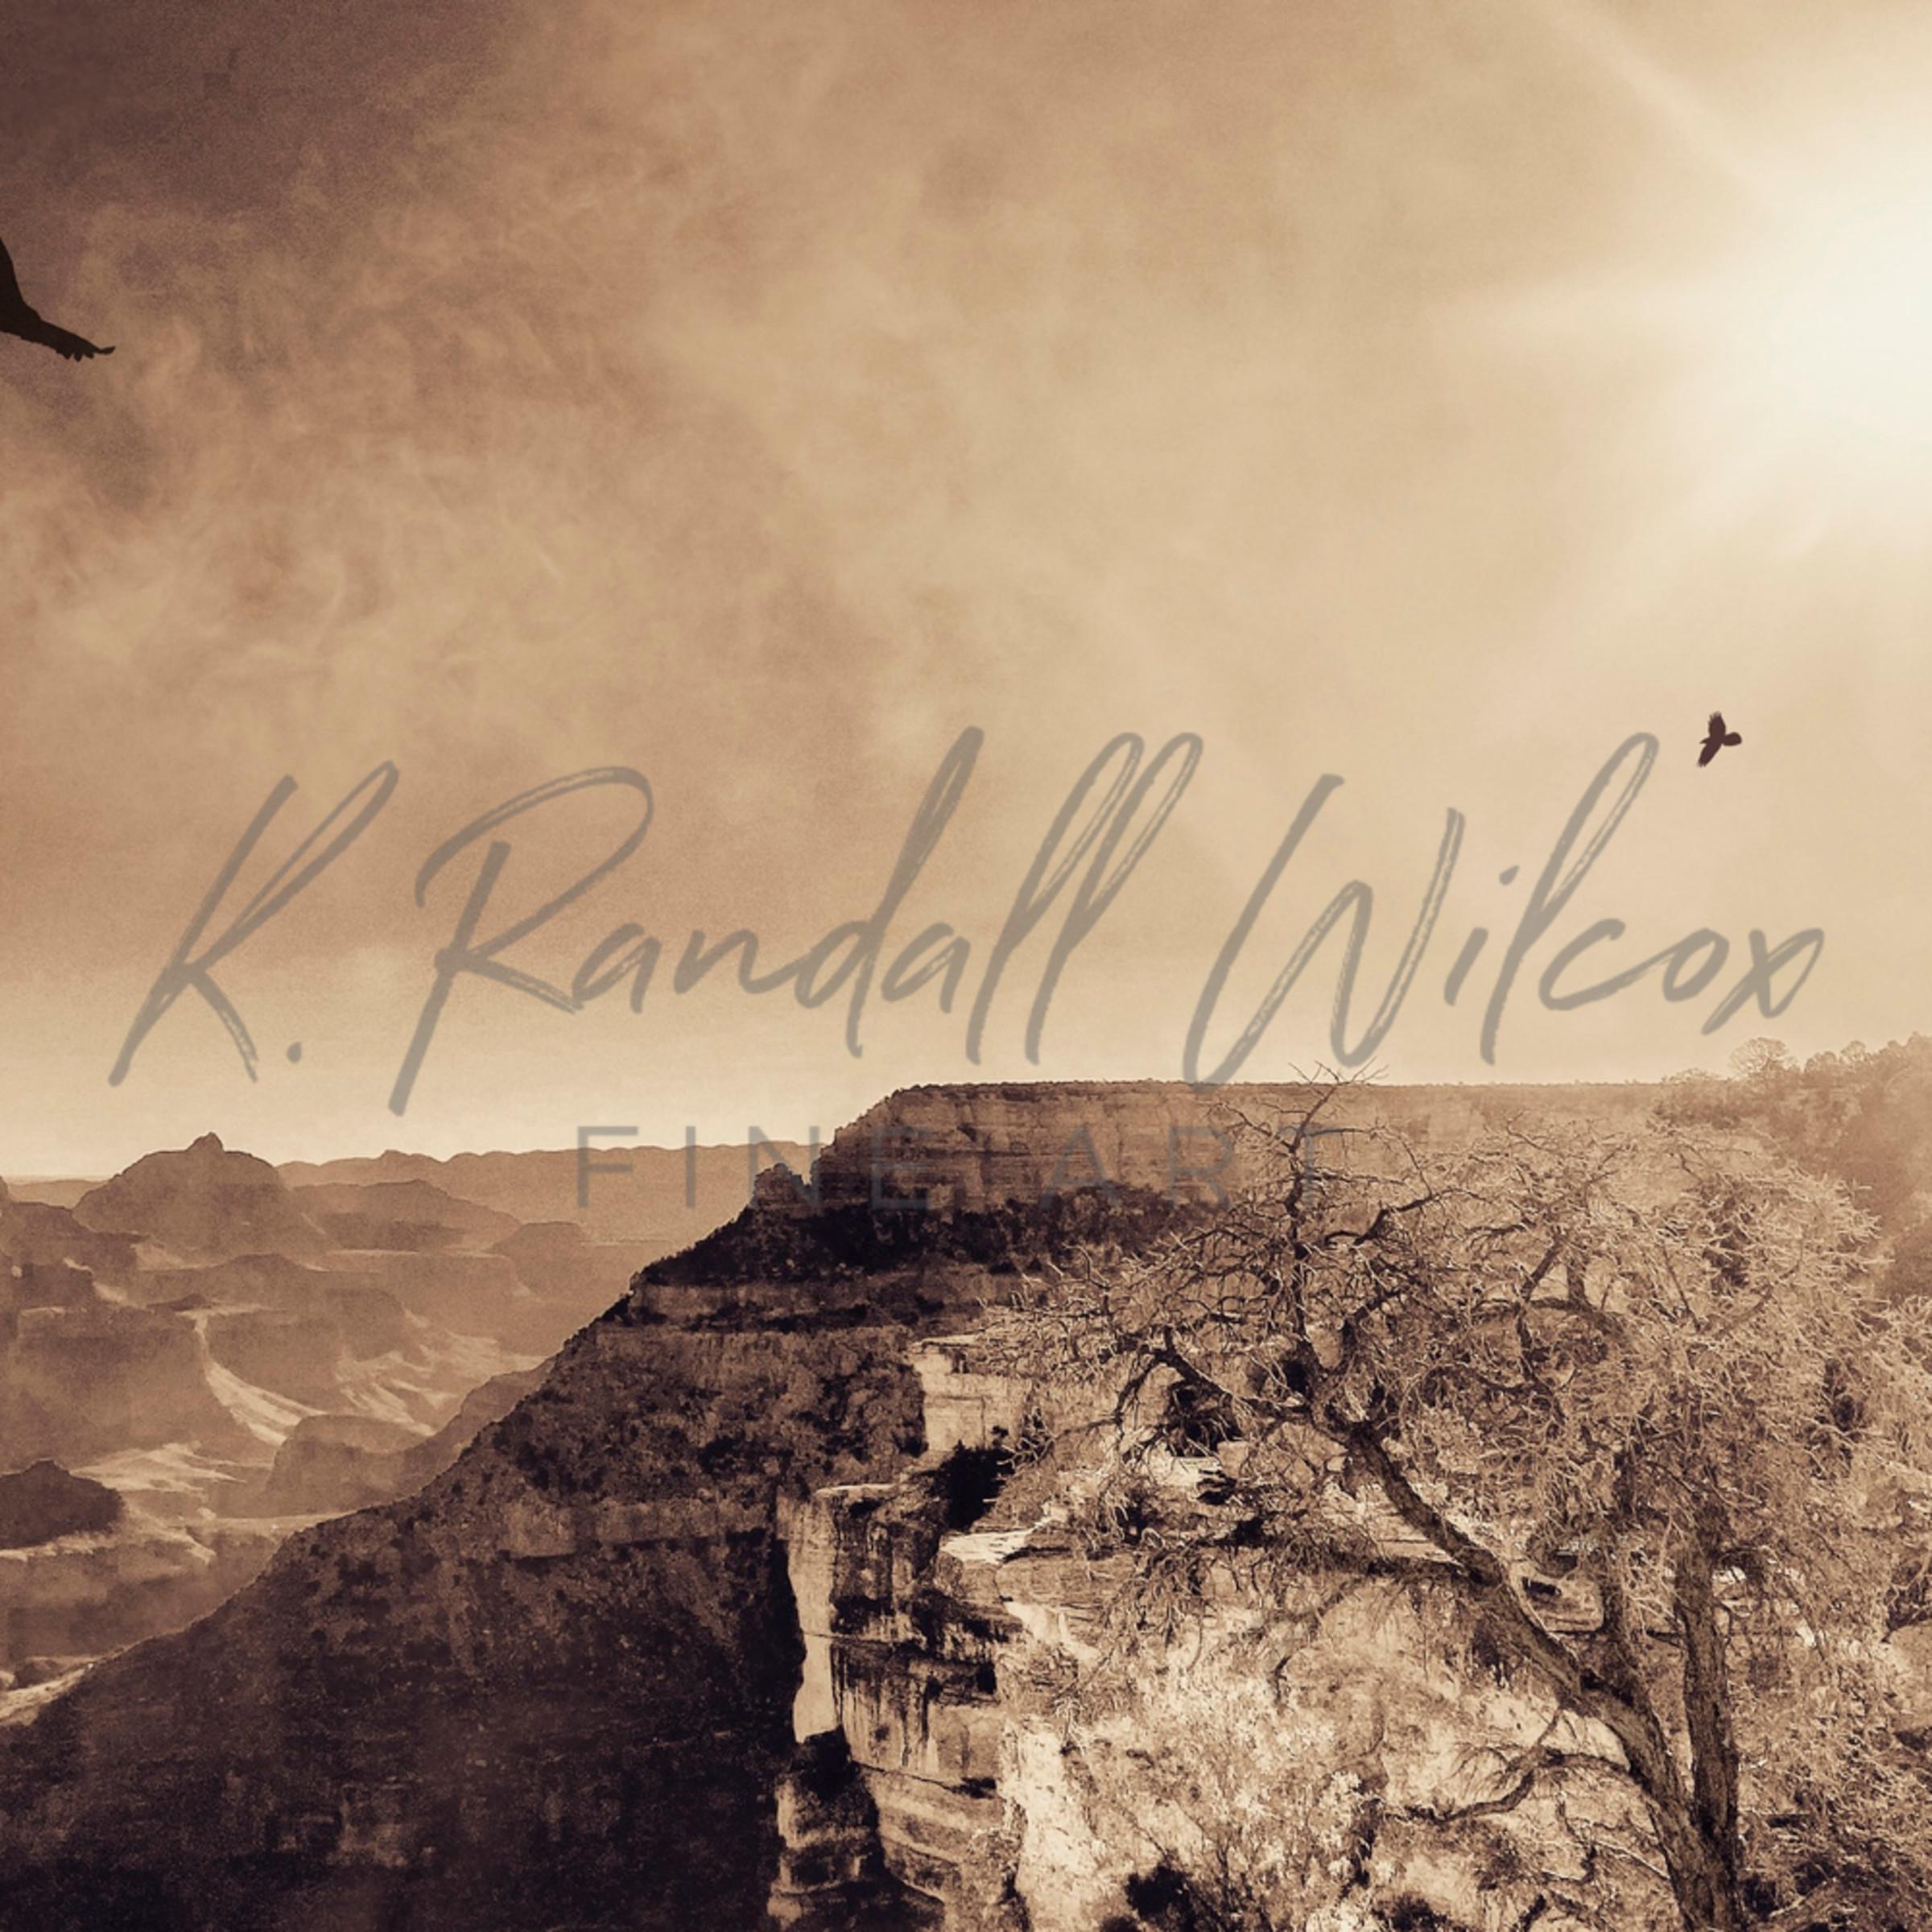 Krw canyon flyers fb6mw6